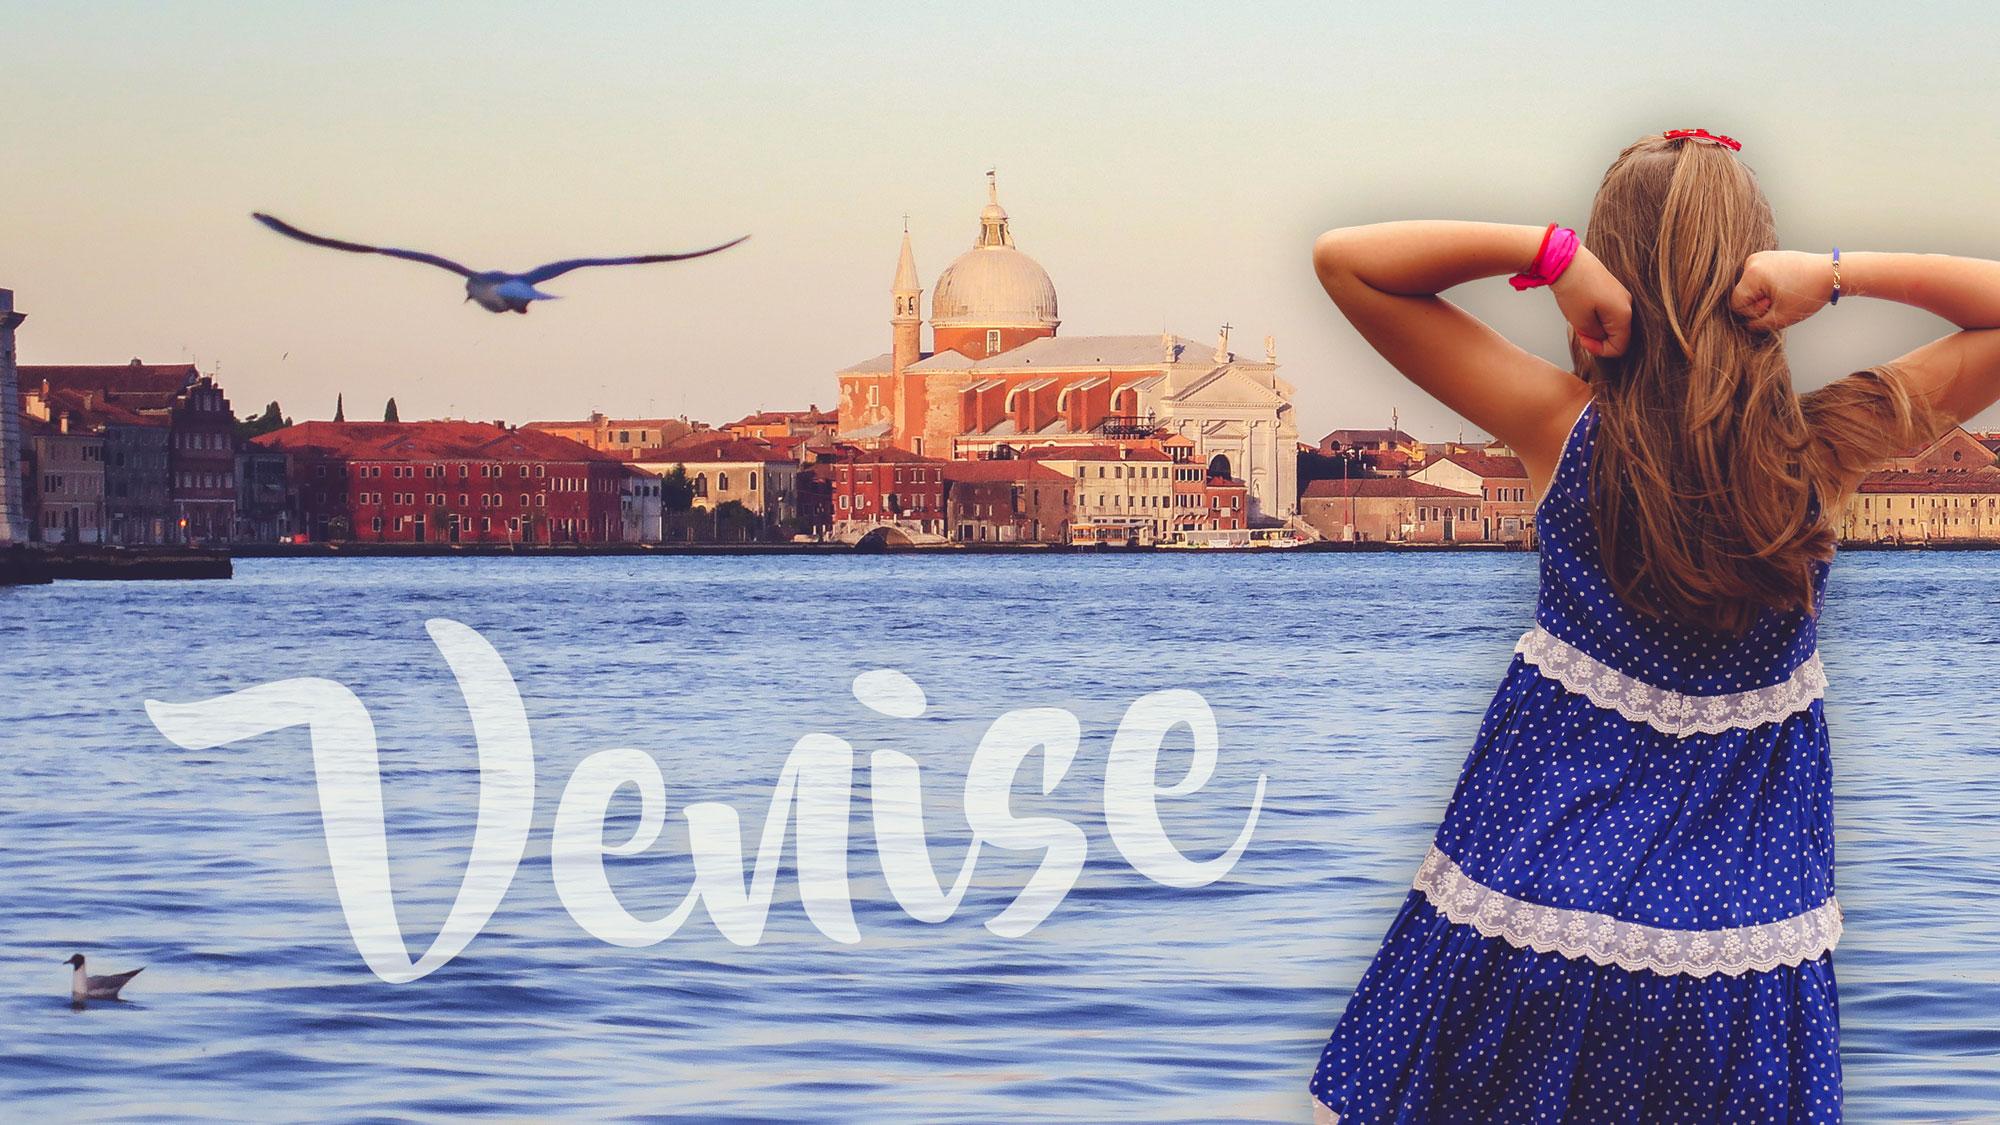 Visiter Venise en famille